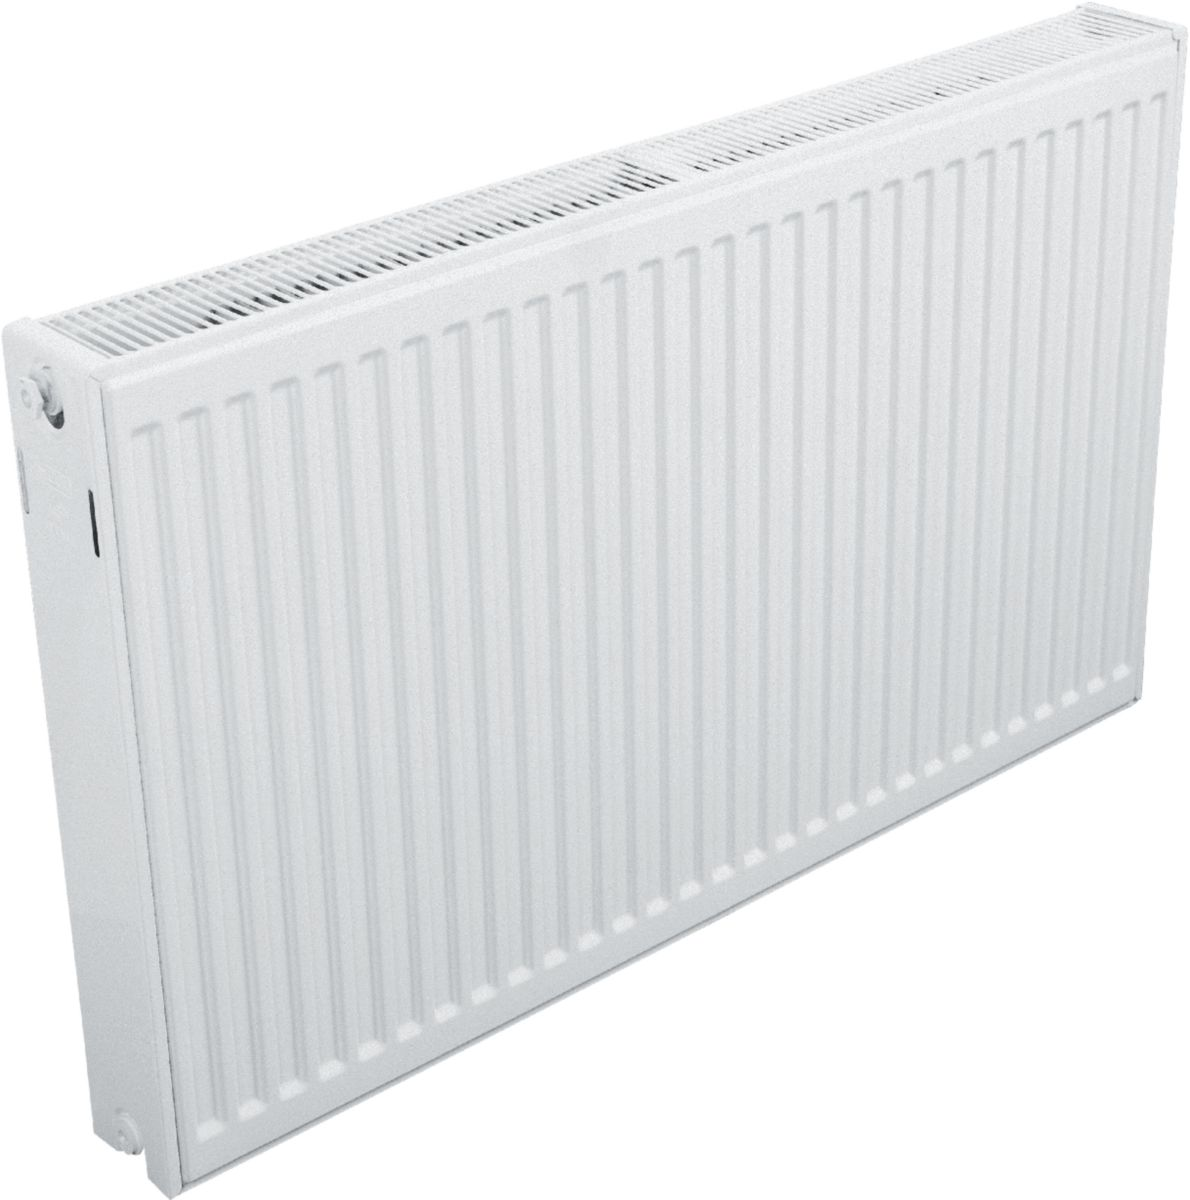 radiateur en hauteur best helloshopfr helloshopfr with radiateur en hauteur zoom with. Black Bedroom Furniture Sets. Home Design Ideas